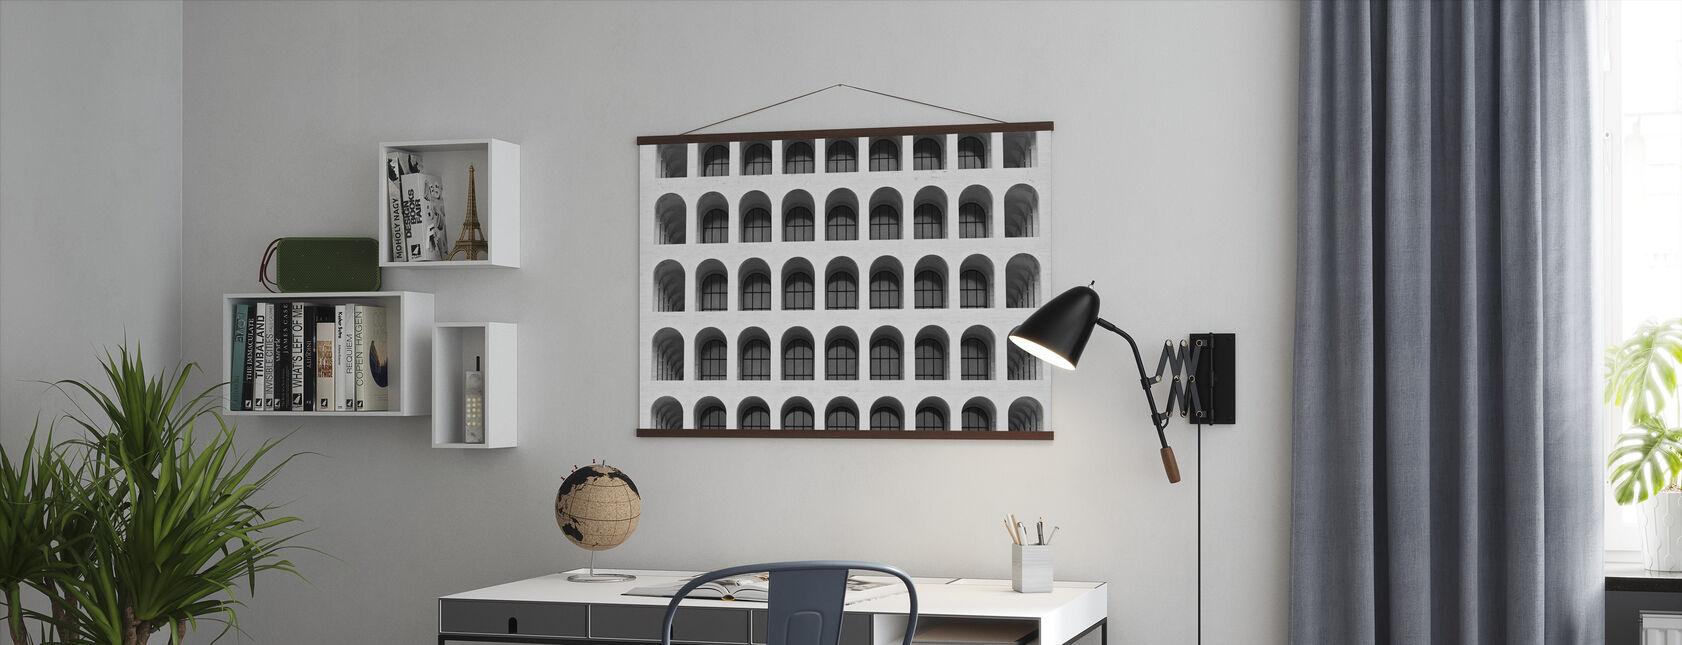 Colosseum - Poster - Kantoor